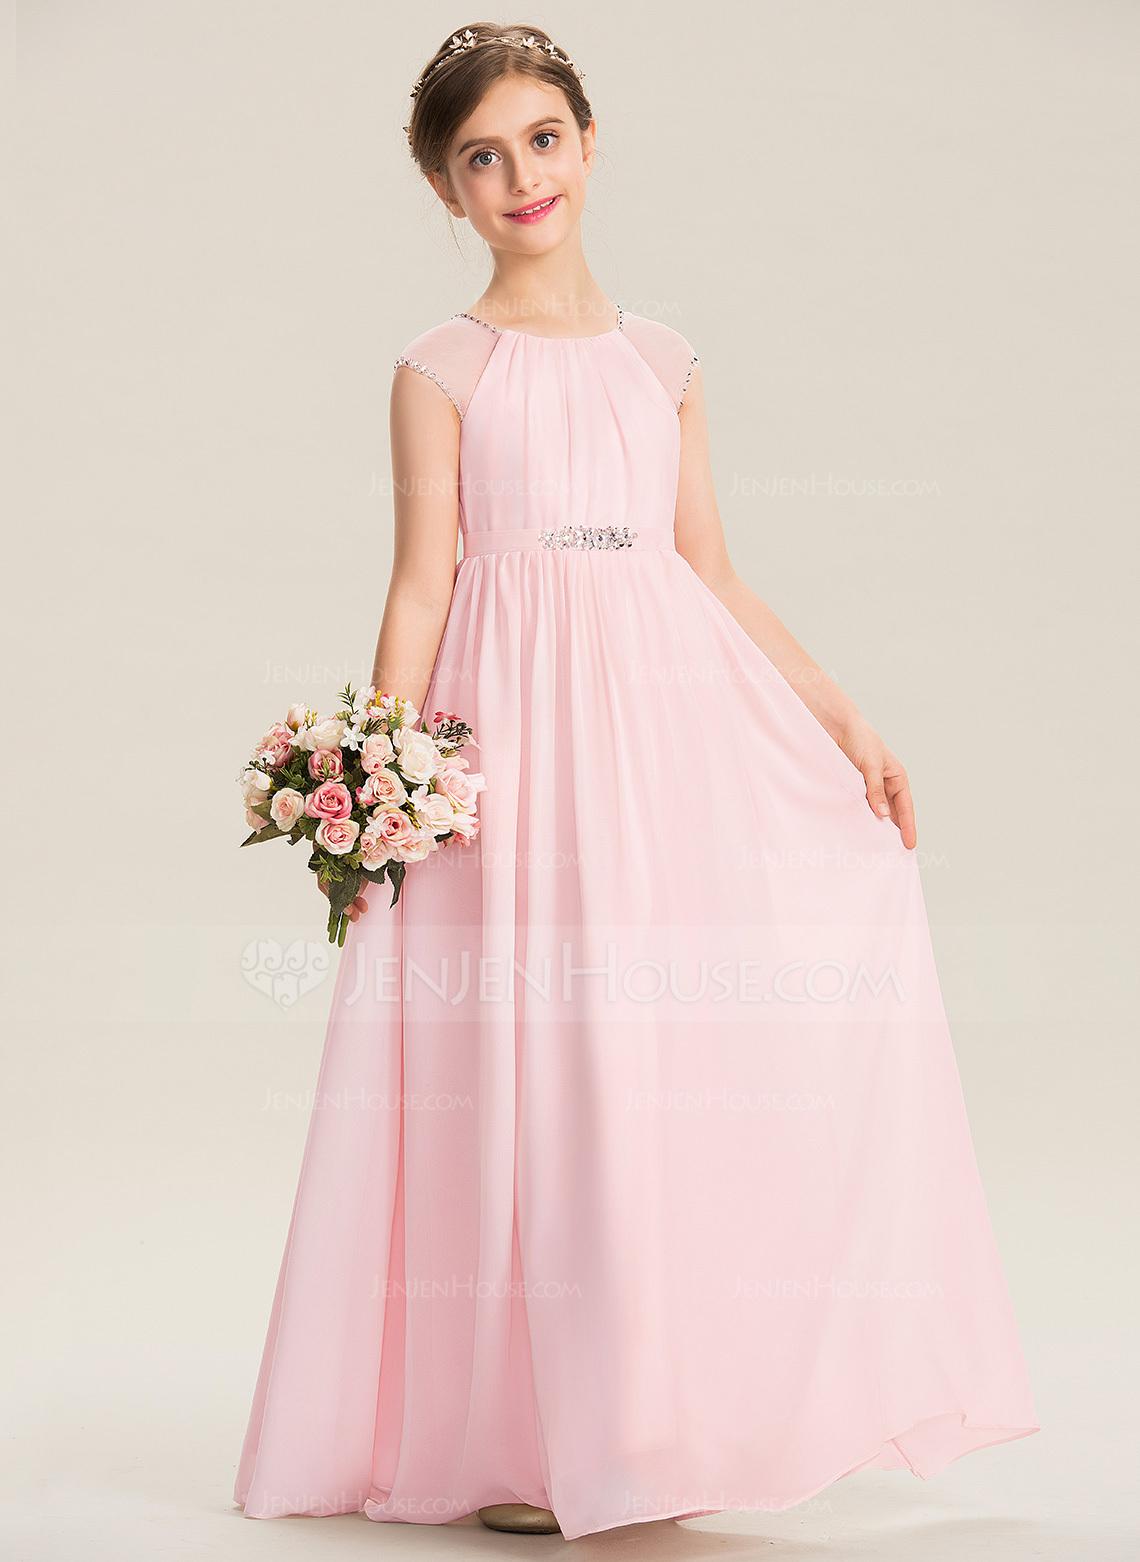 7133c05547 A-Line Scoop Neck Floor-Length Chiffon Junior Bridesmaid Dress With Beading  Sequins  173303